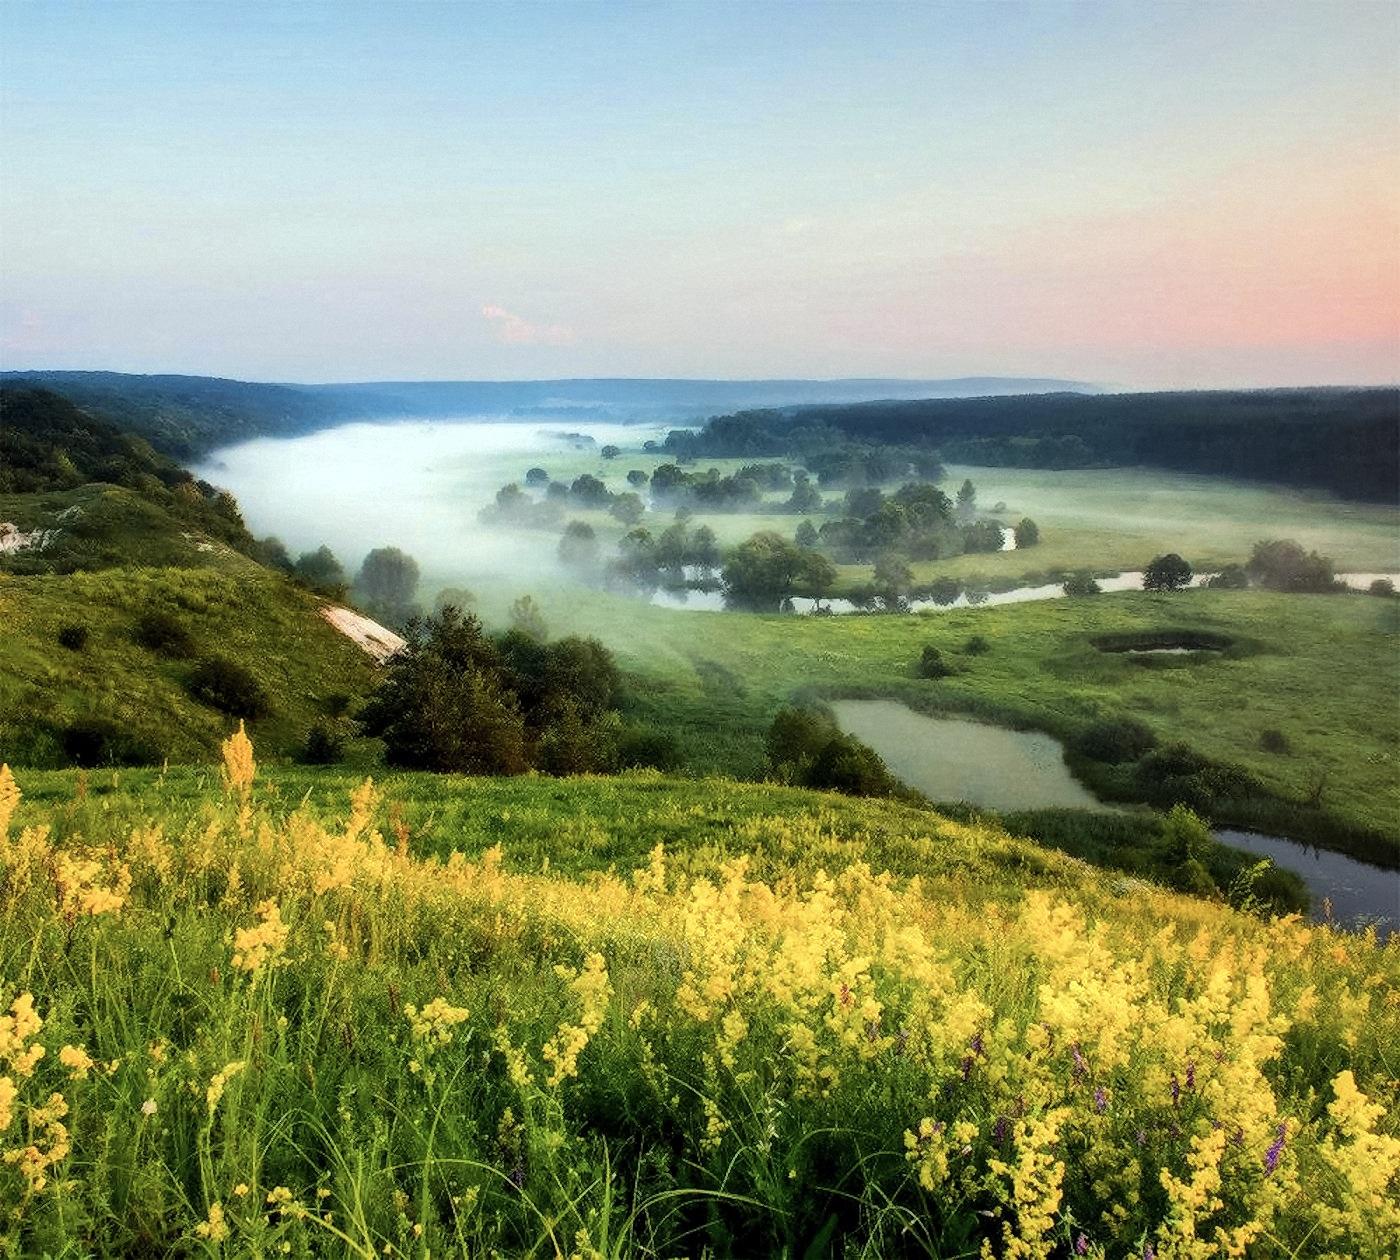 00-viktor-tulbanov-northern-donets-river-kharkov-oblast-2016